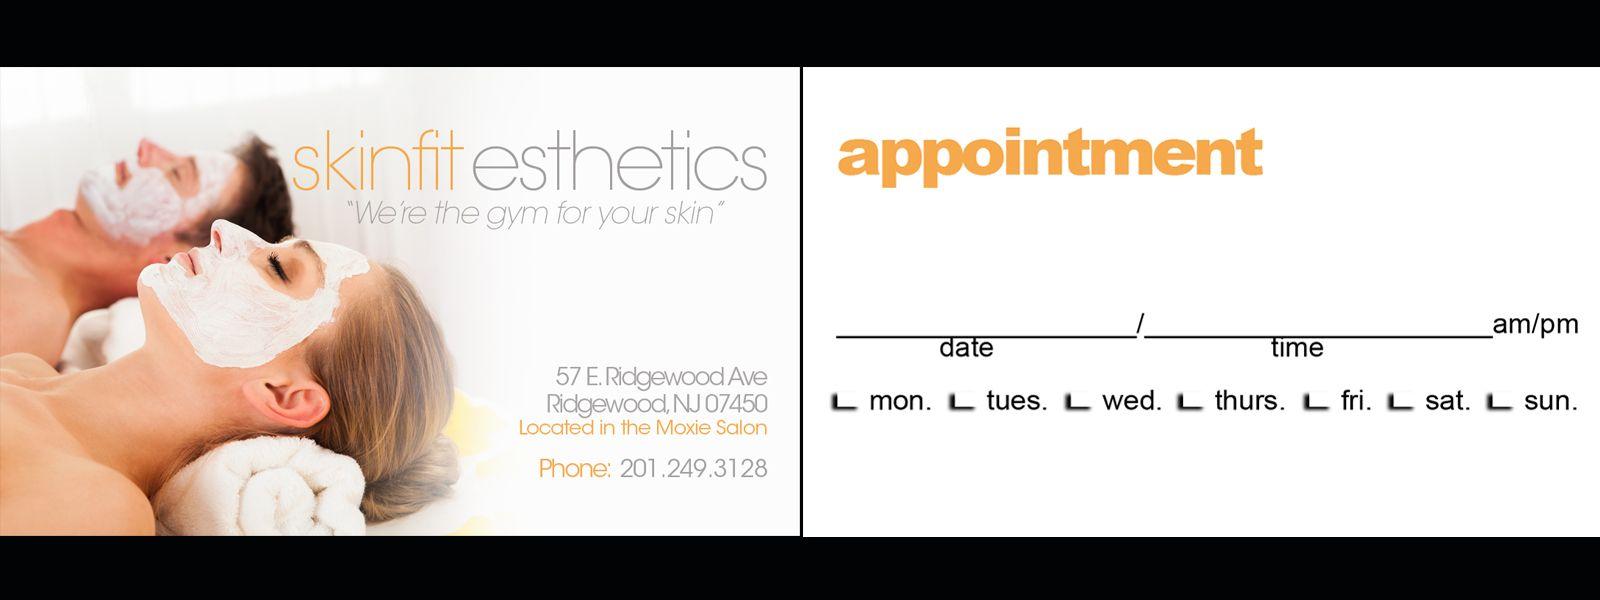 Unique Esthetician Business Cards Ideas | esthetics business card ...